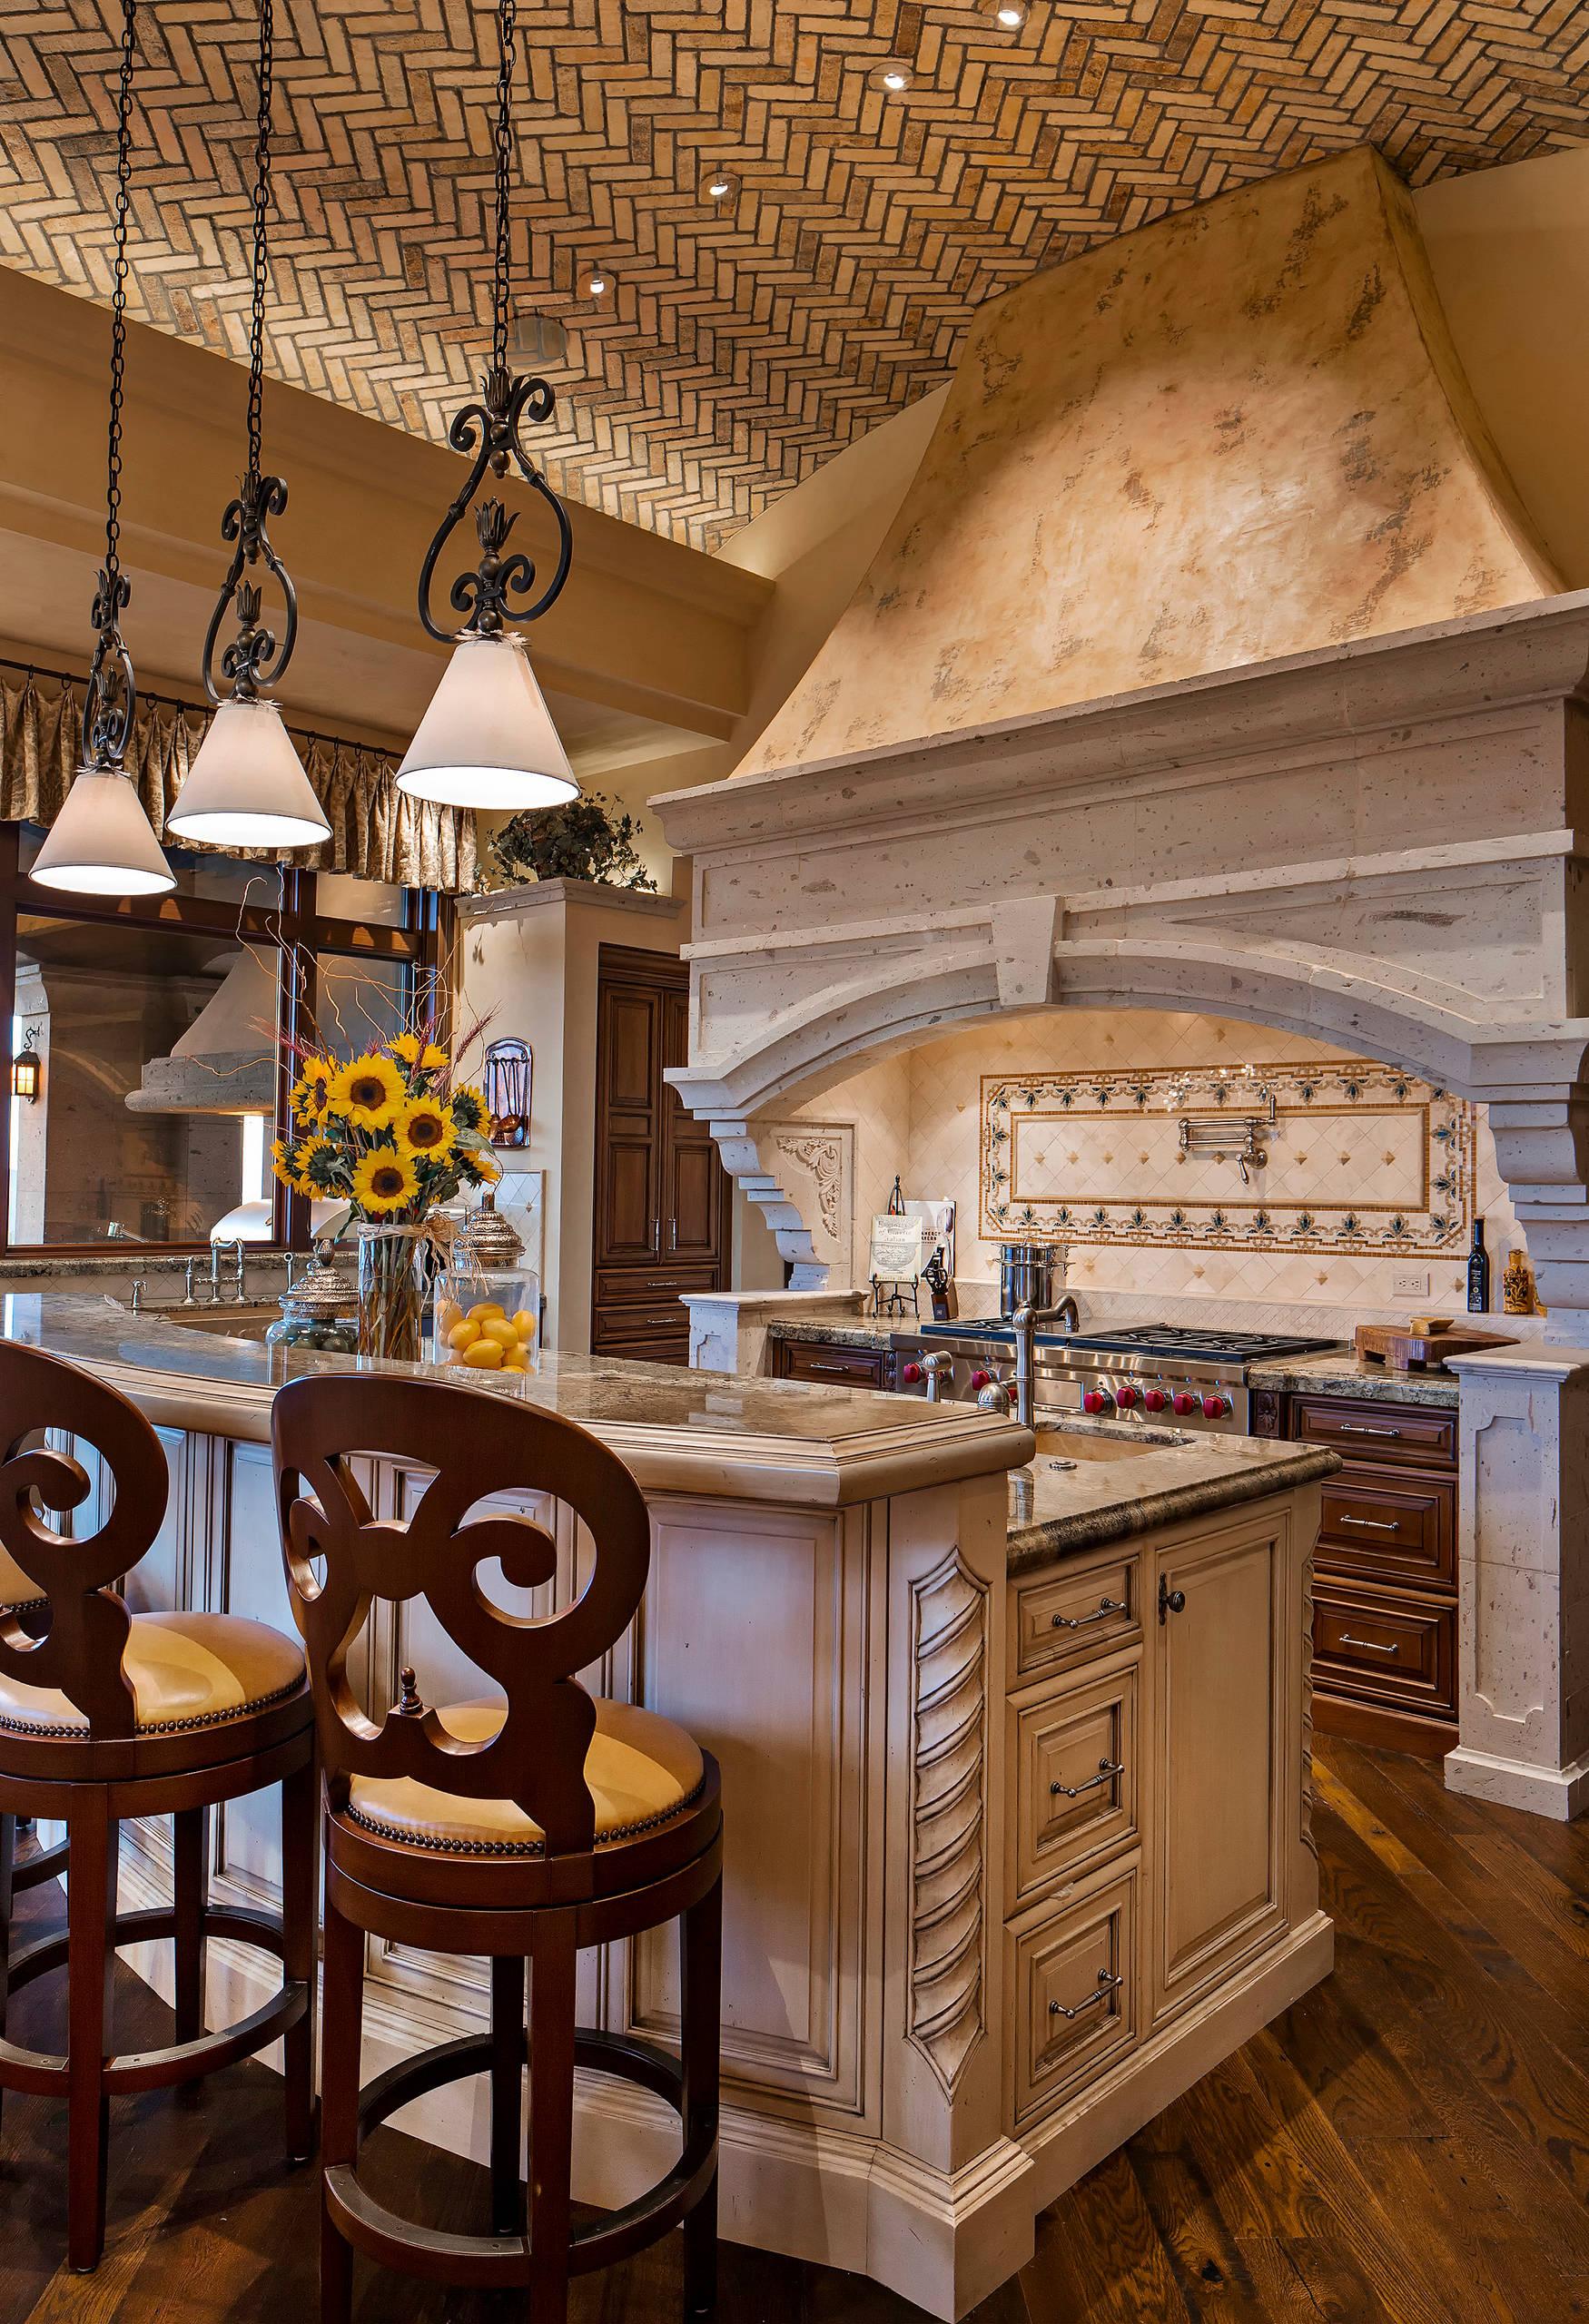 16 Charming Mediterranean Kitchen Designs That Will ... on Farmhouse:4Leikoxevec= Rustic Kitchen Ideas  id=92977